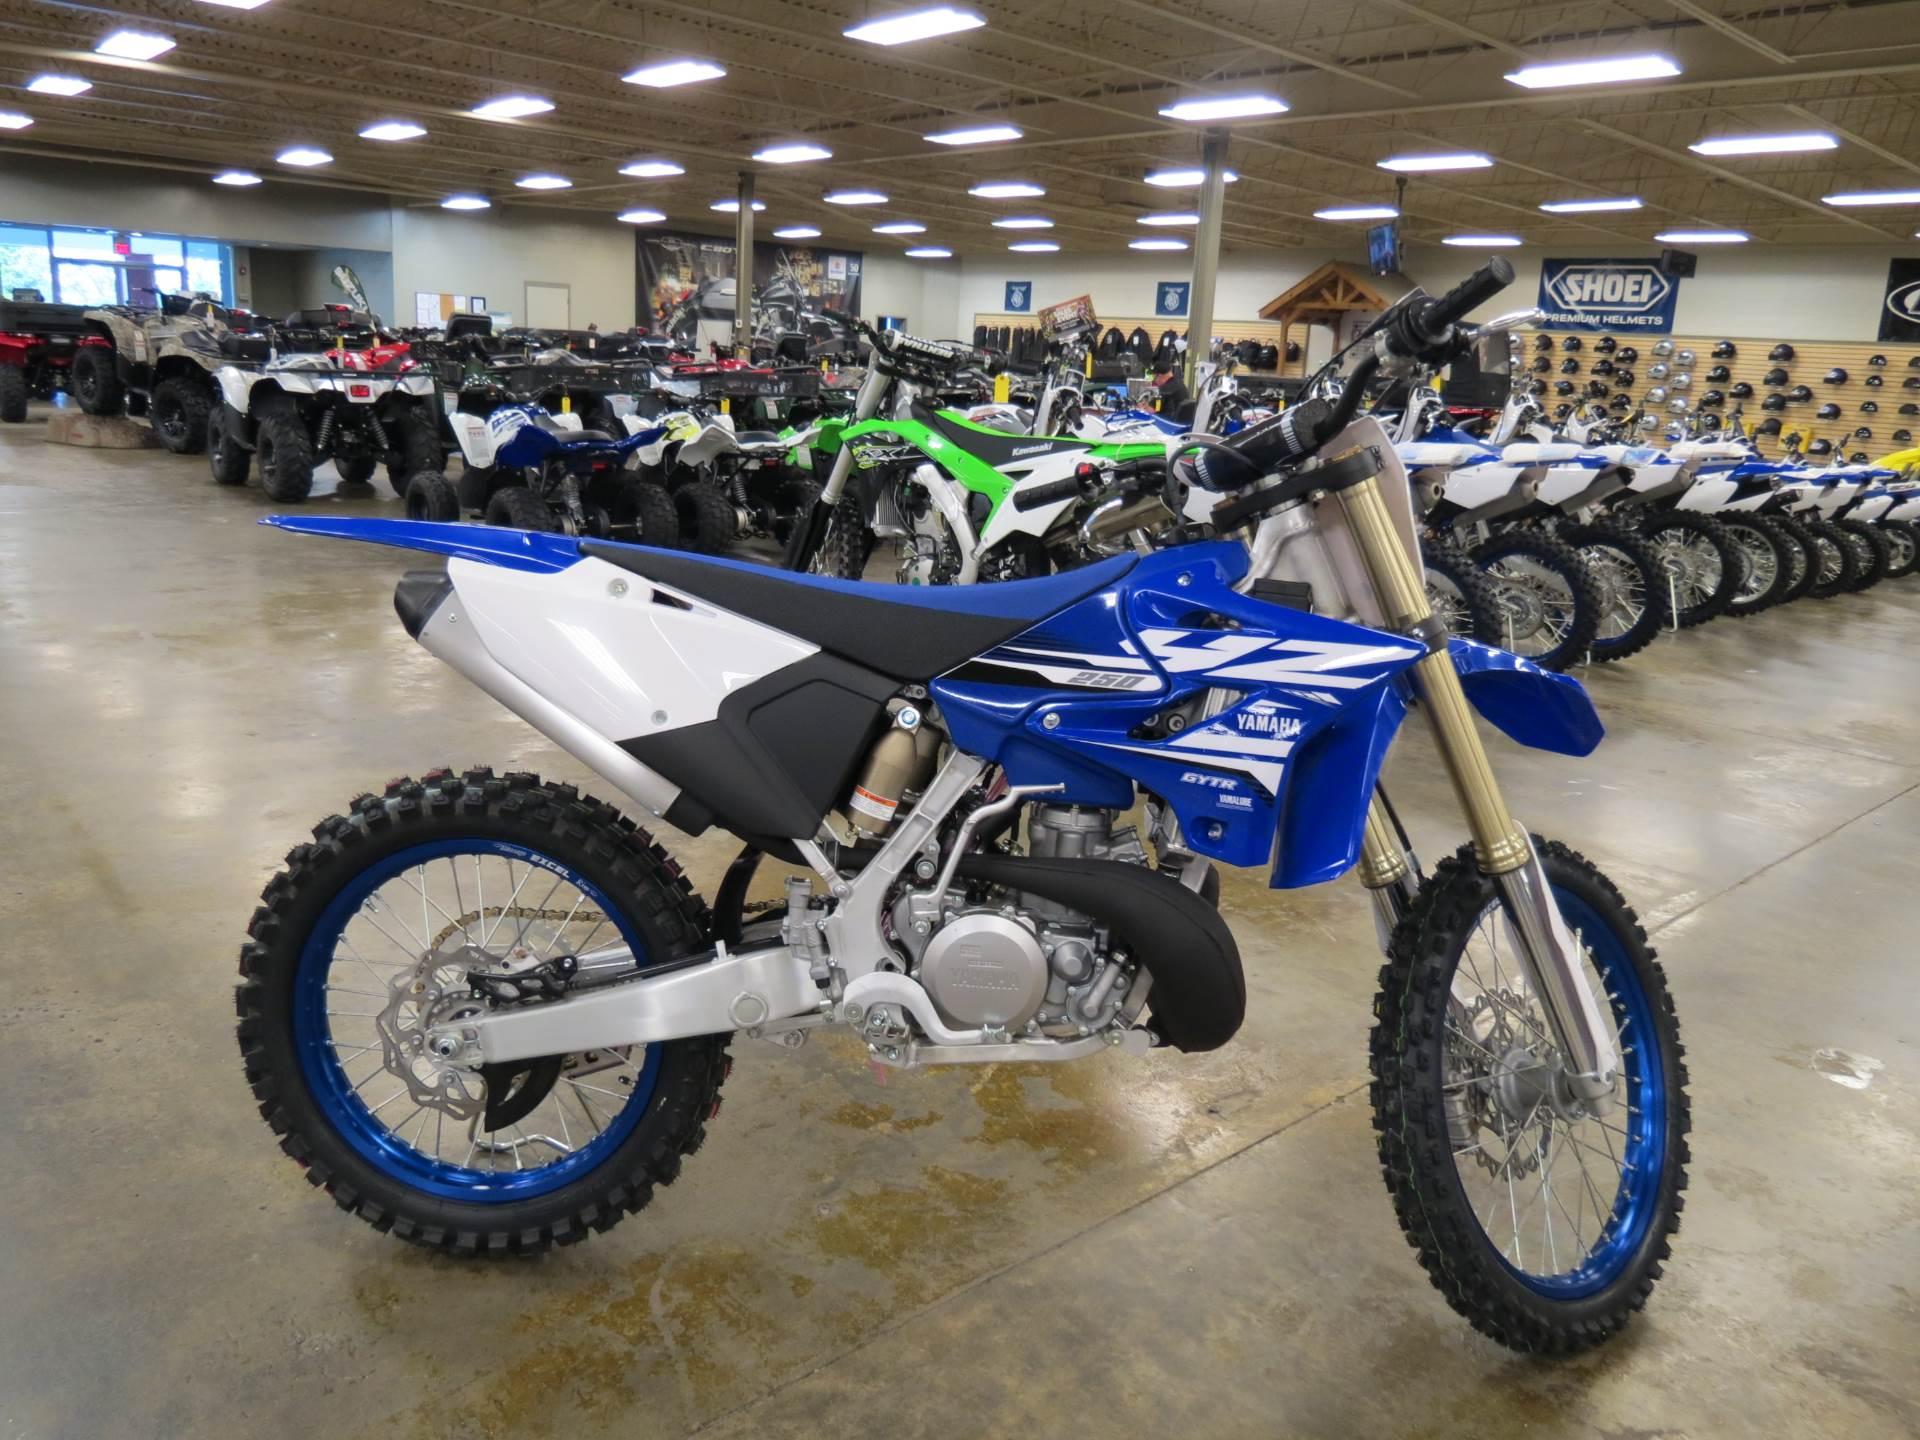 2018 yamaha yz250 motorcycles romney west virginia 35124 for 2018 yamaha yz250